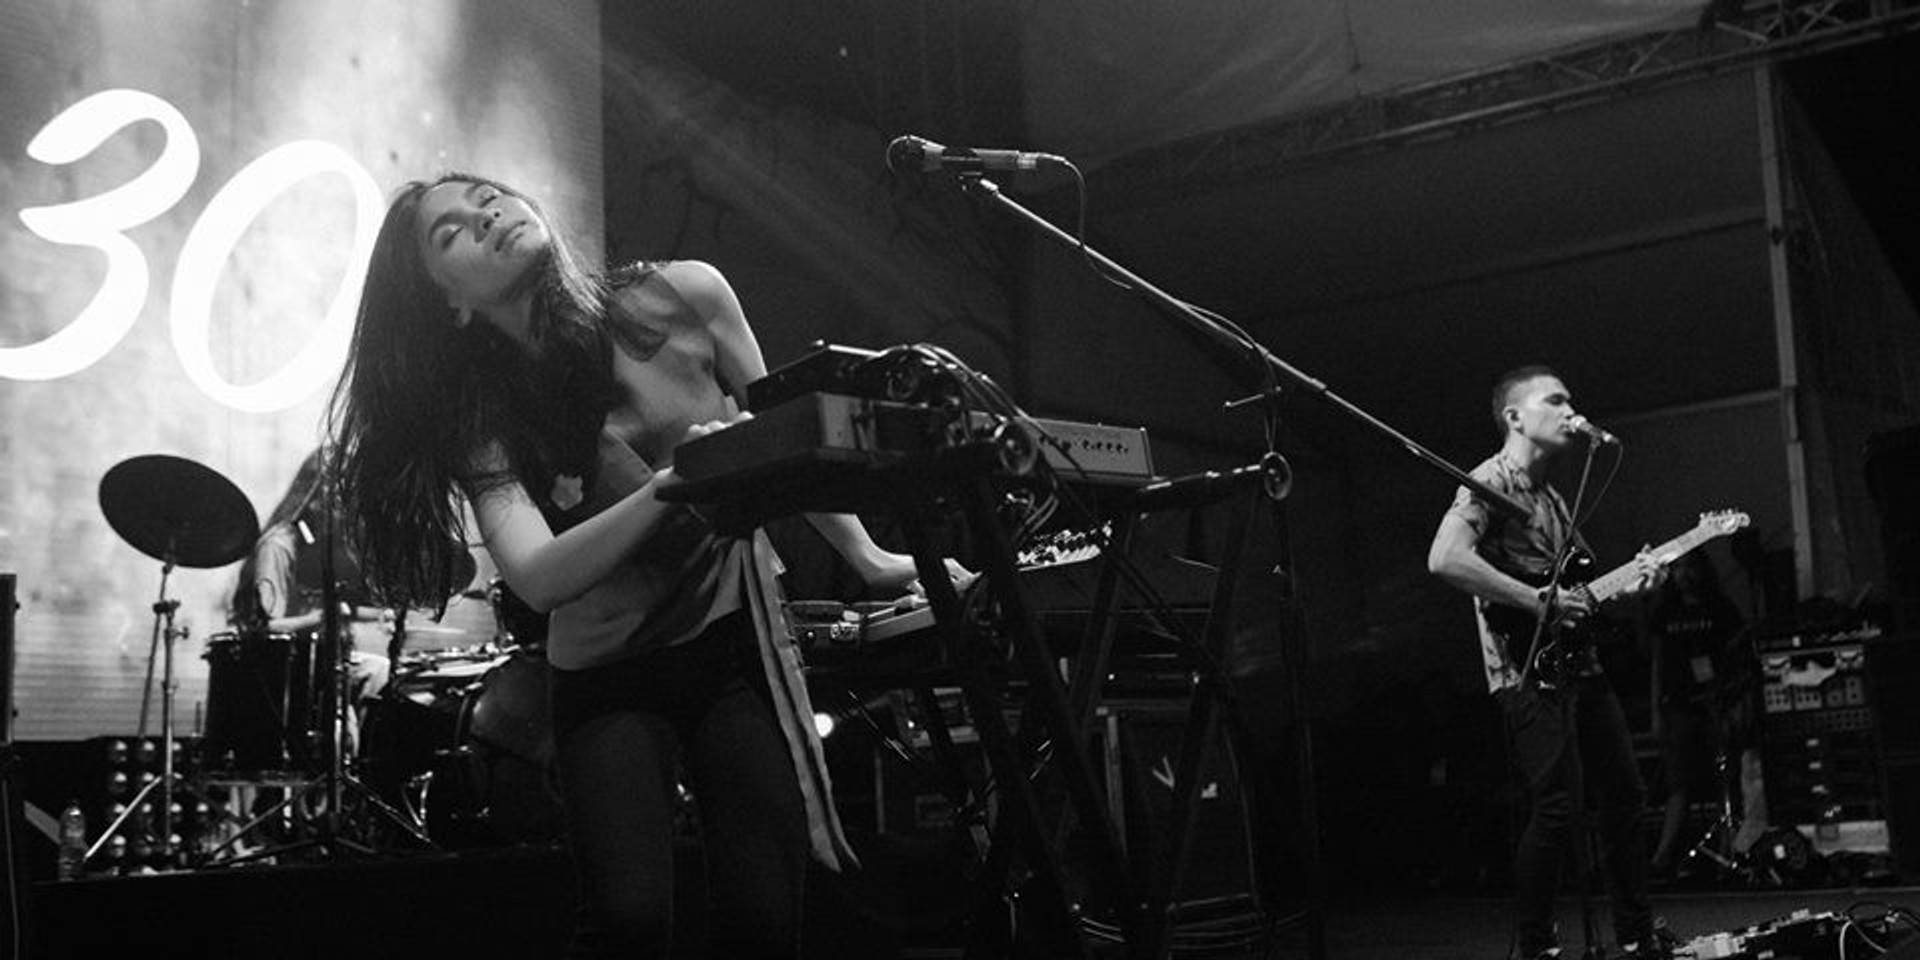 LISTEN: Scaller's surprise release debut album, Senses